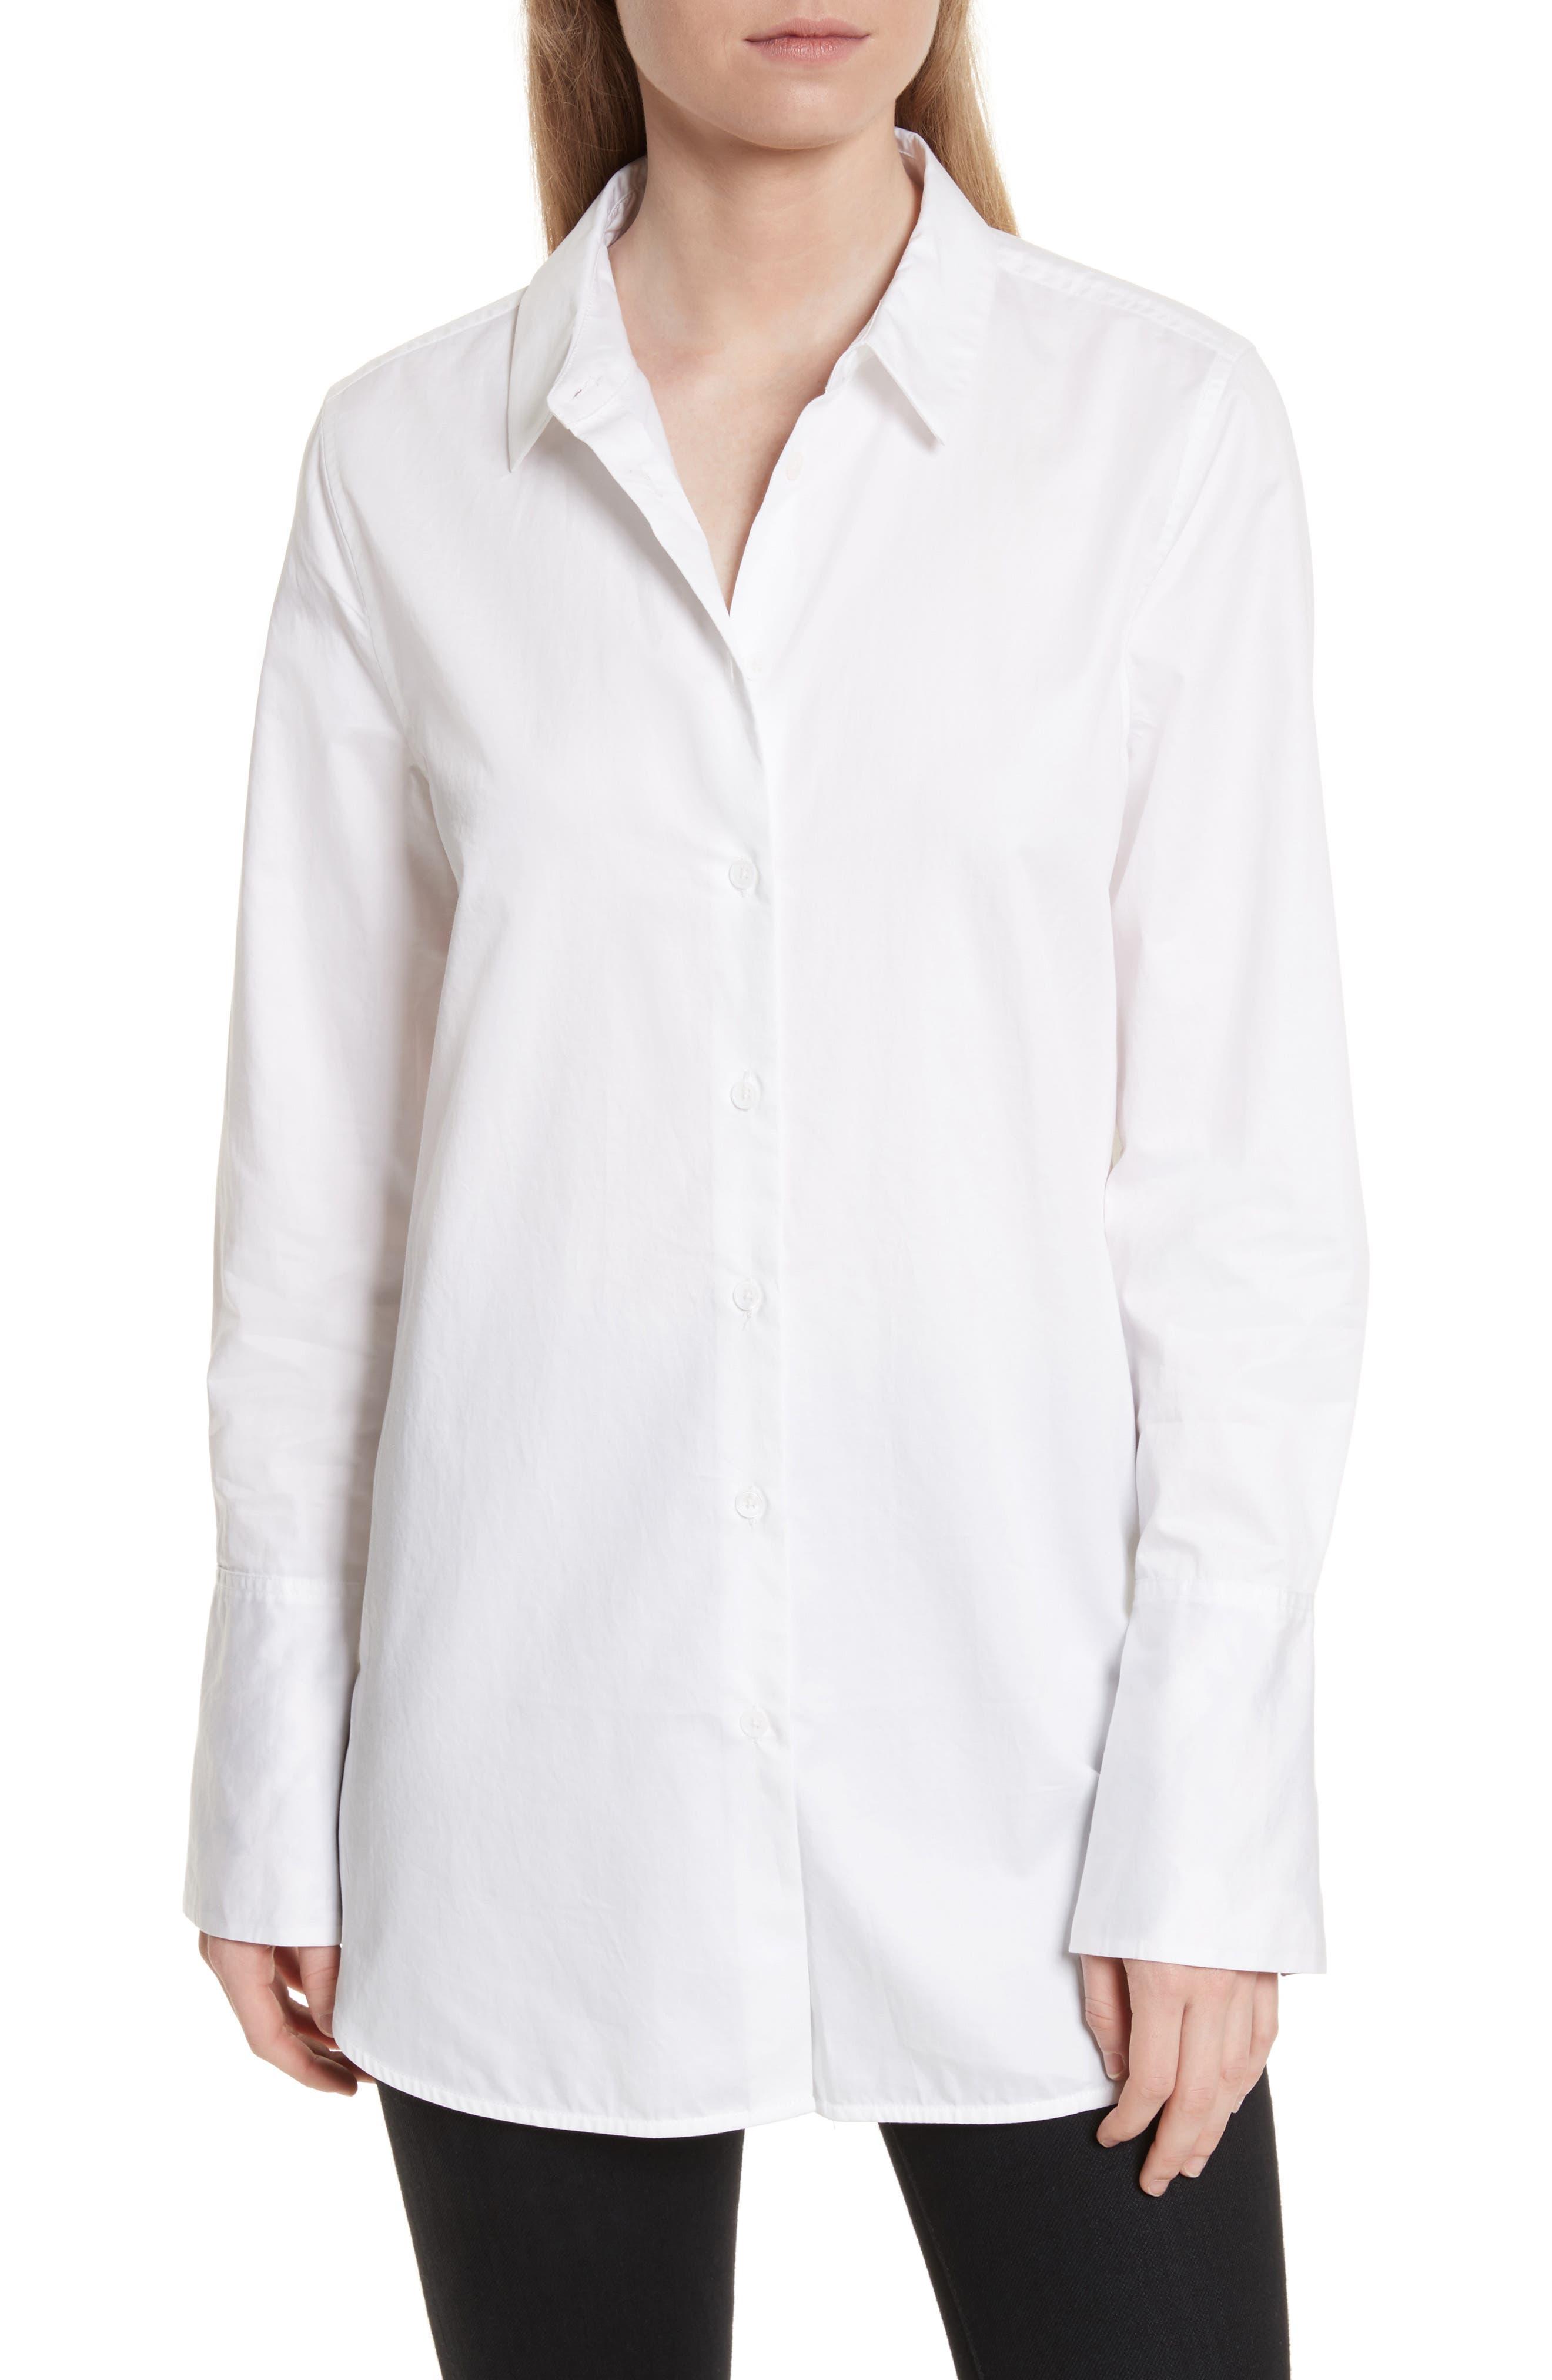 Main Image - Equipment Arlette Cotton Shirt